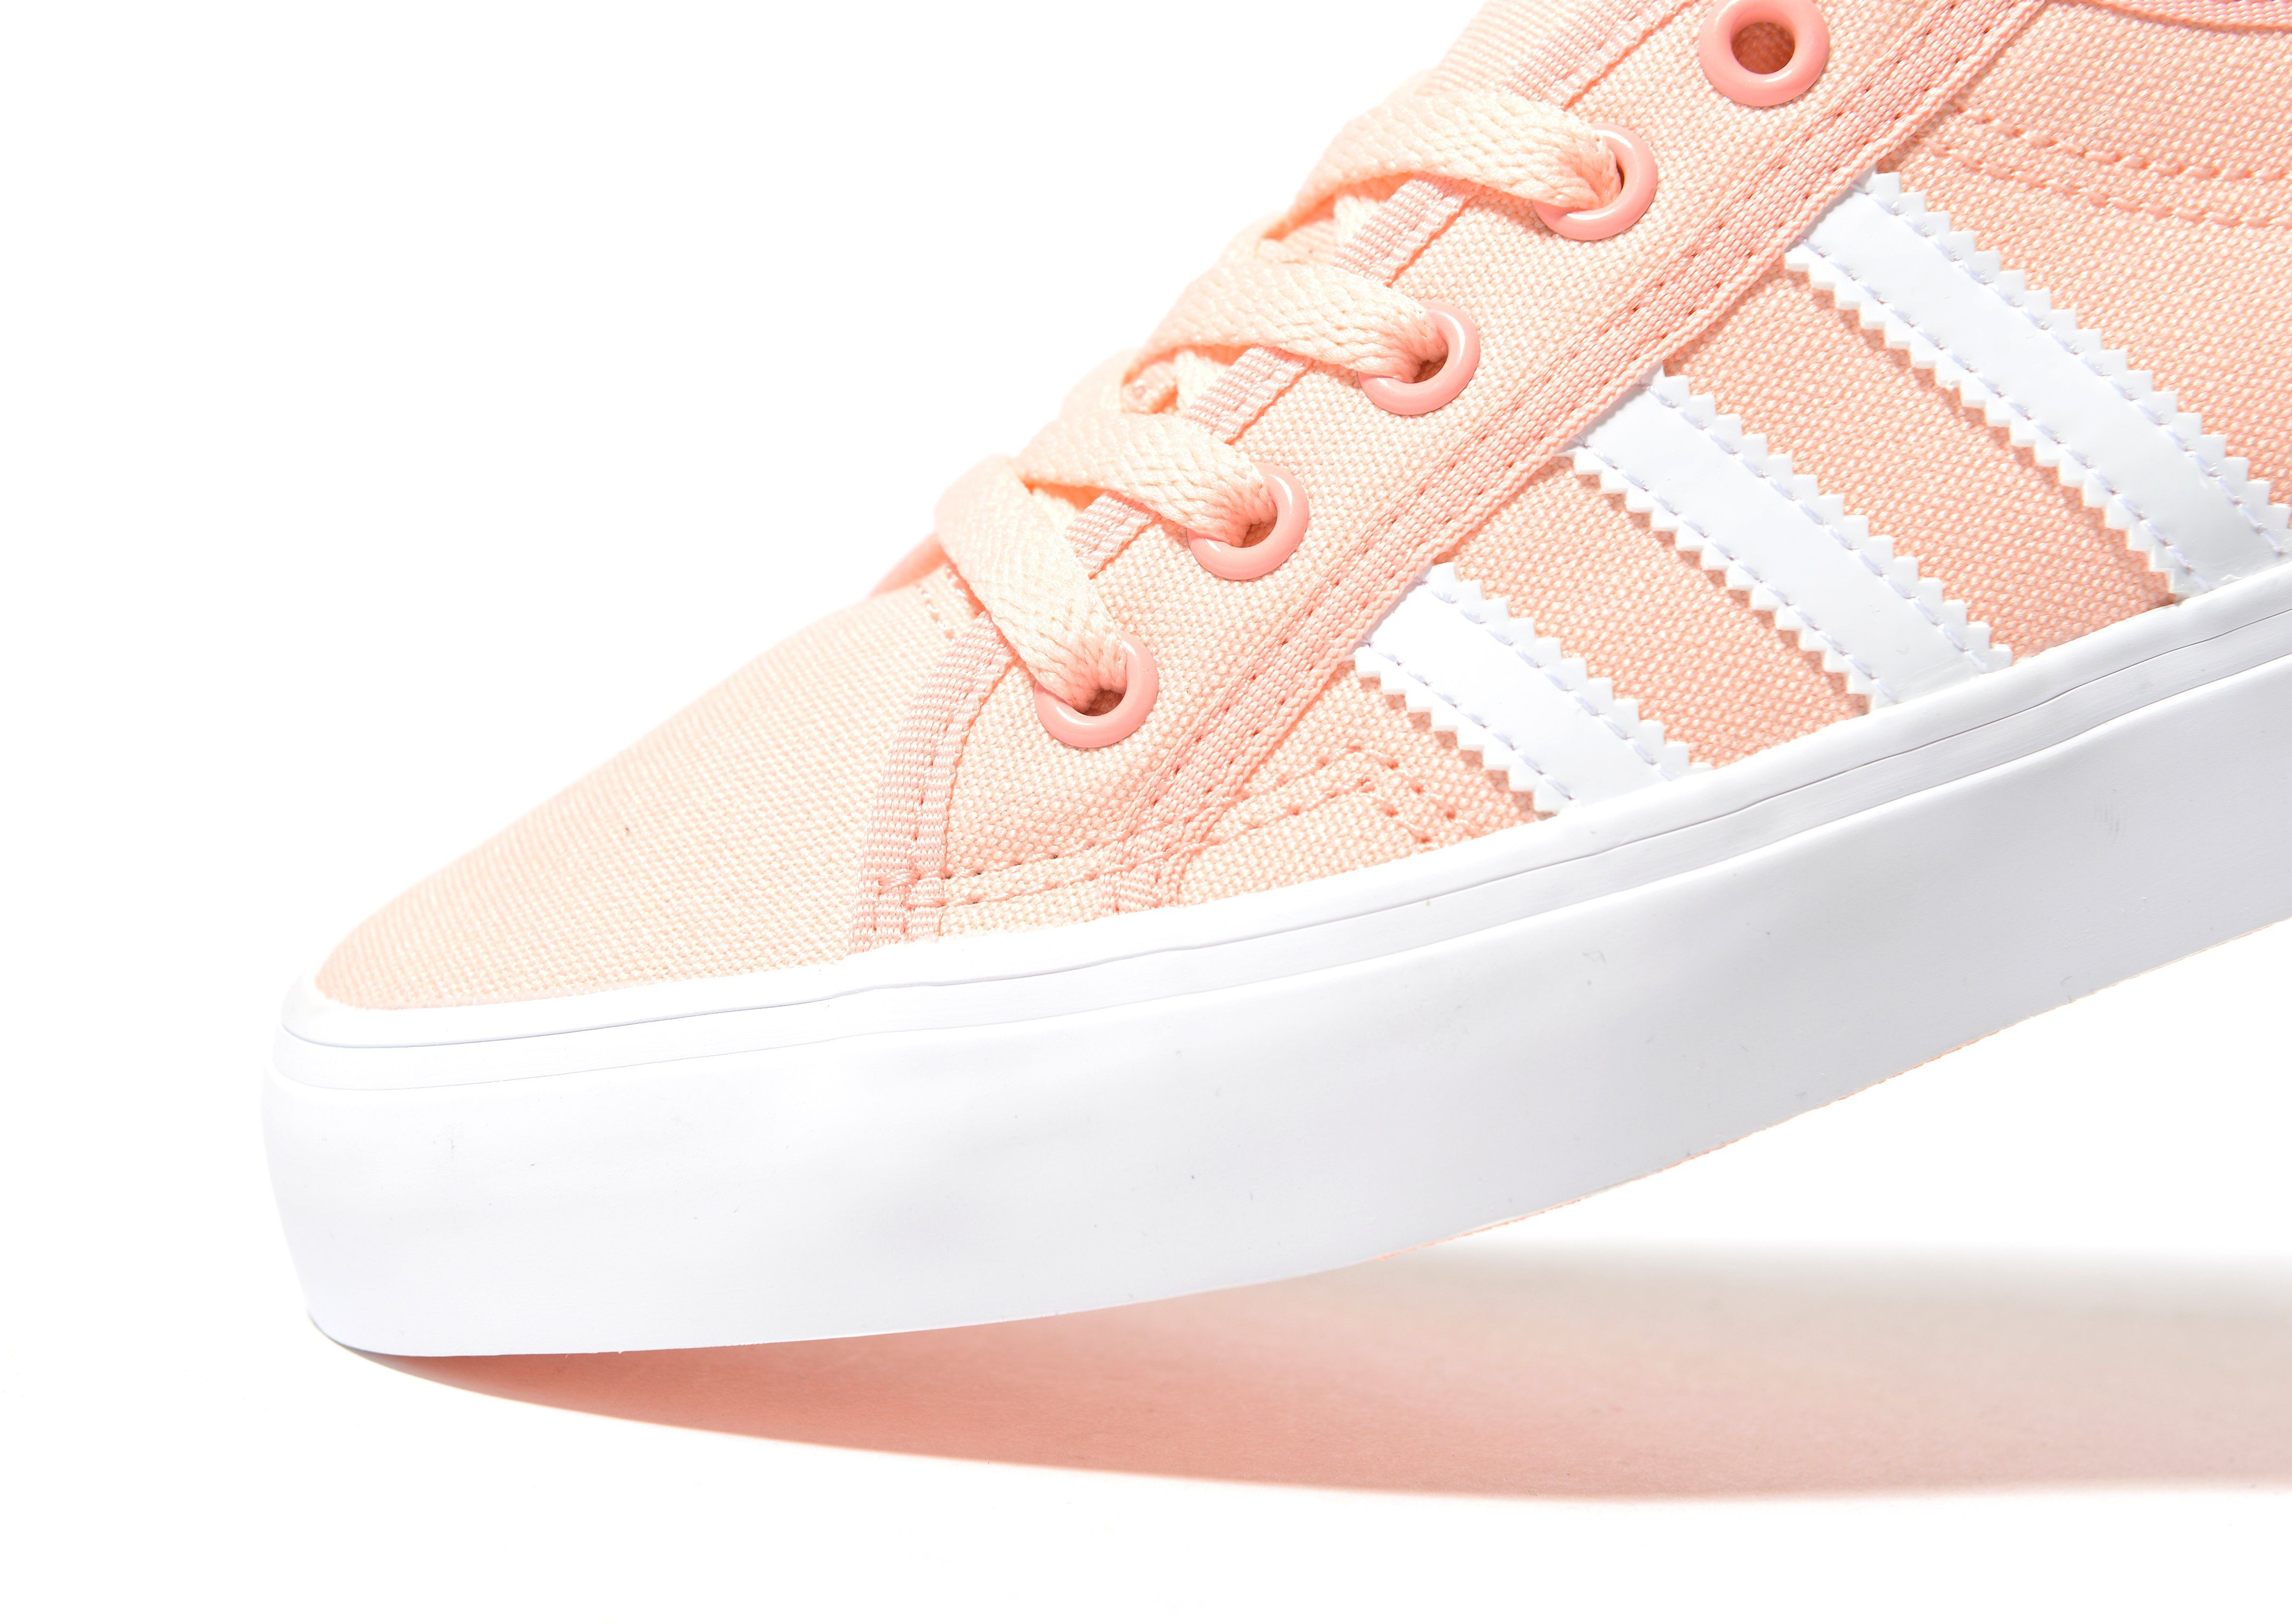 Nizza Adidas Chaussures De Sport Rose Bas